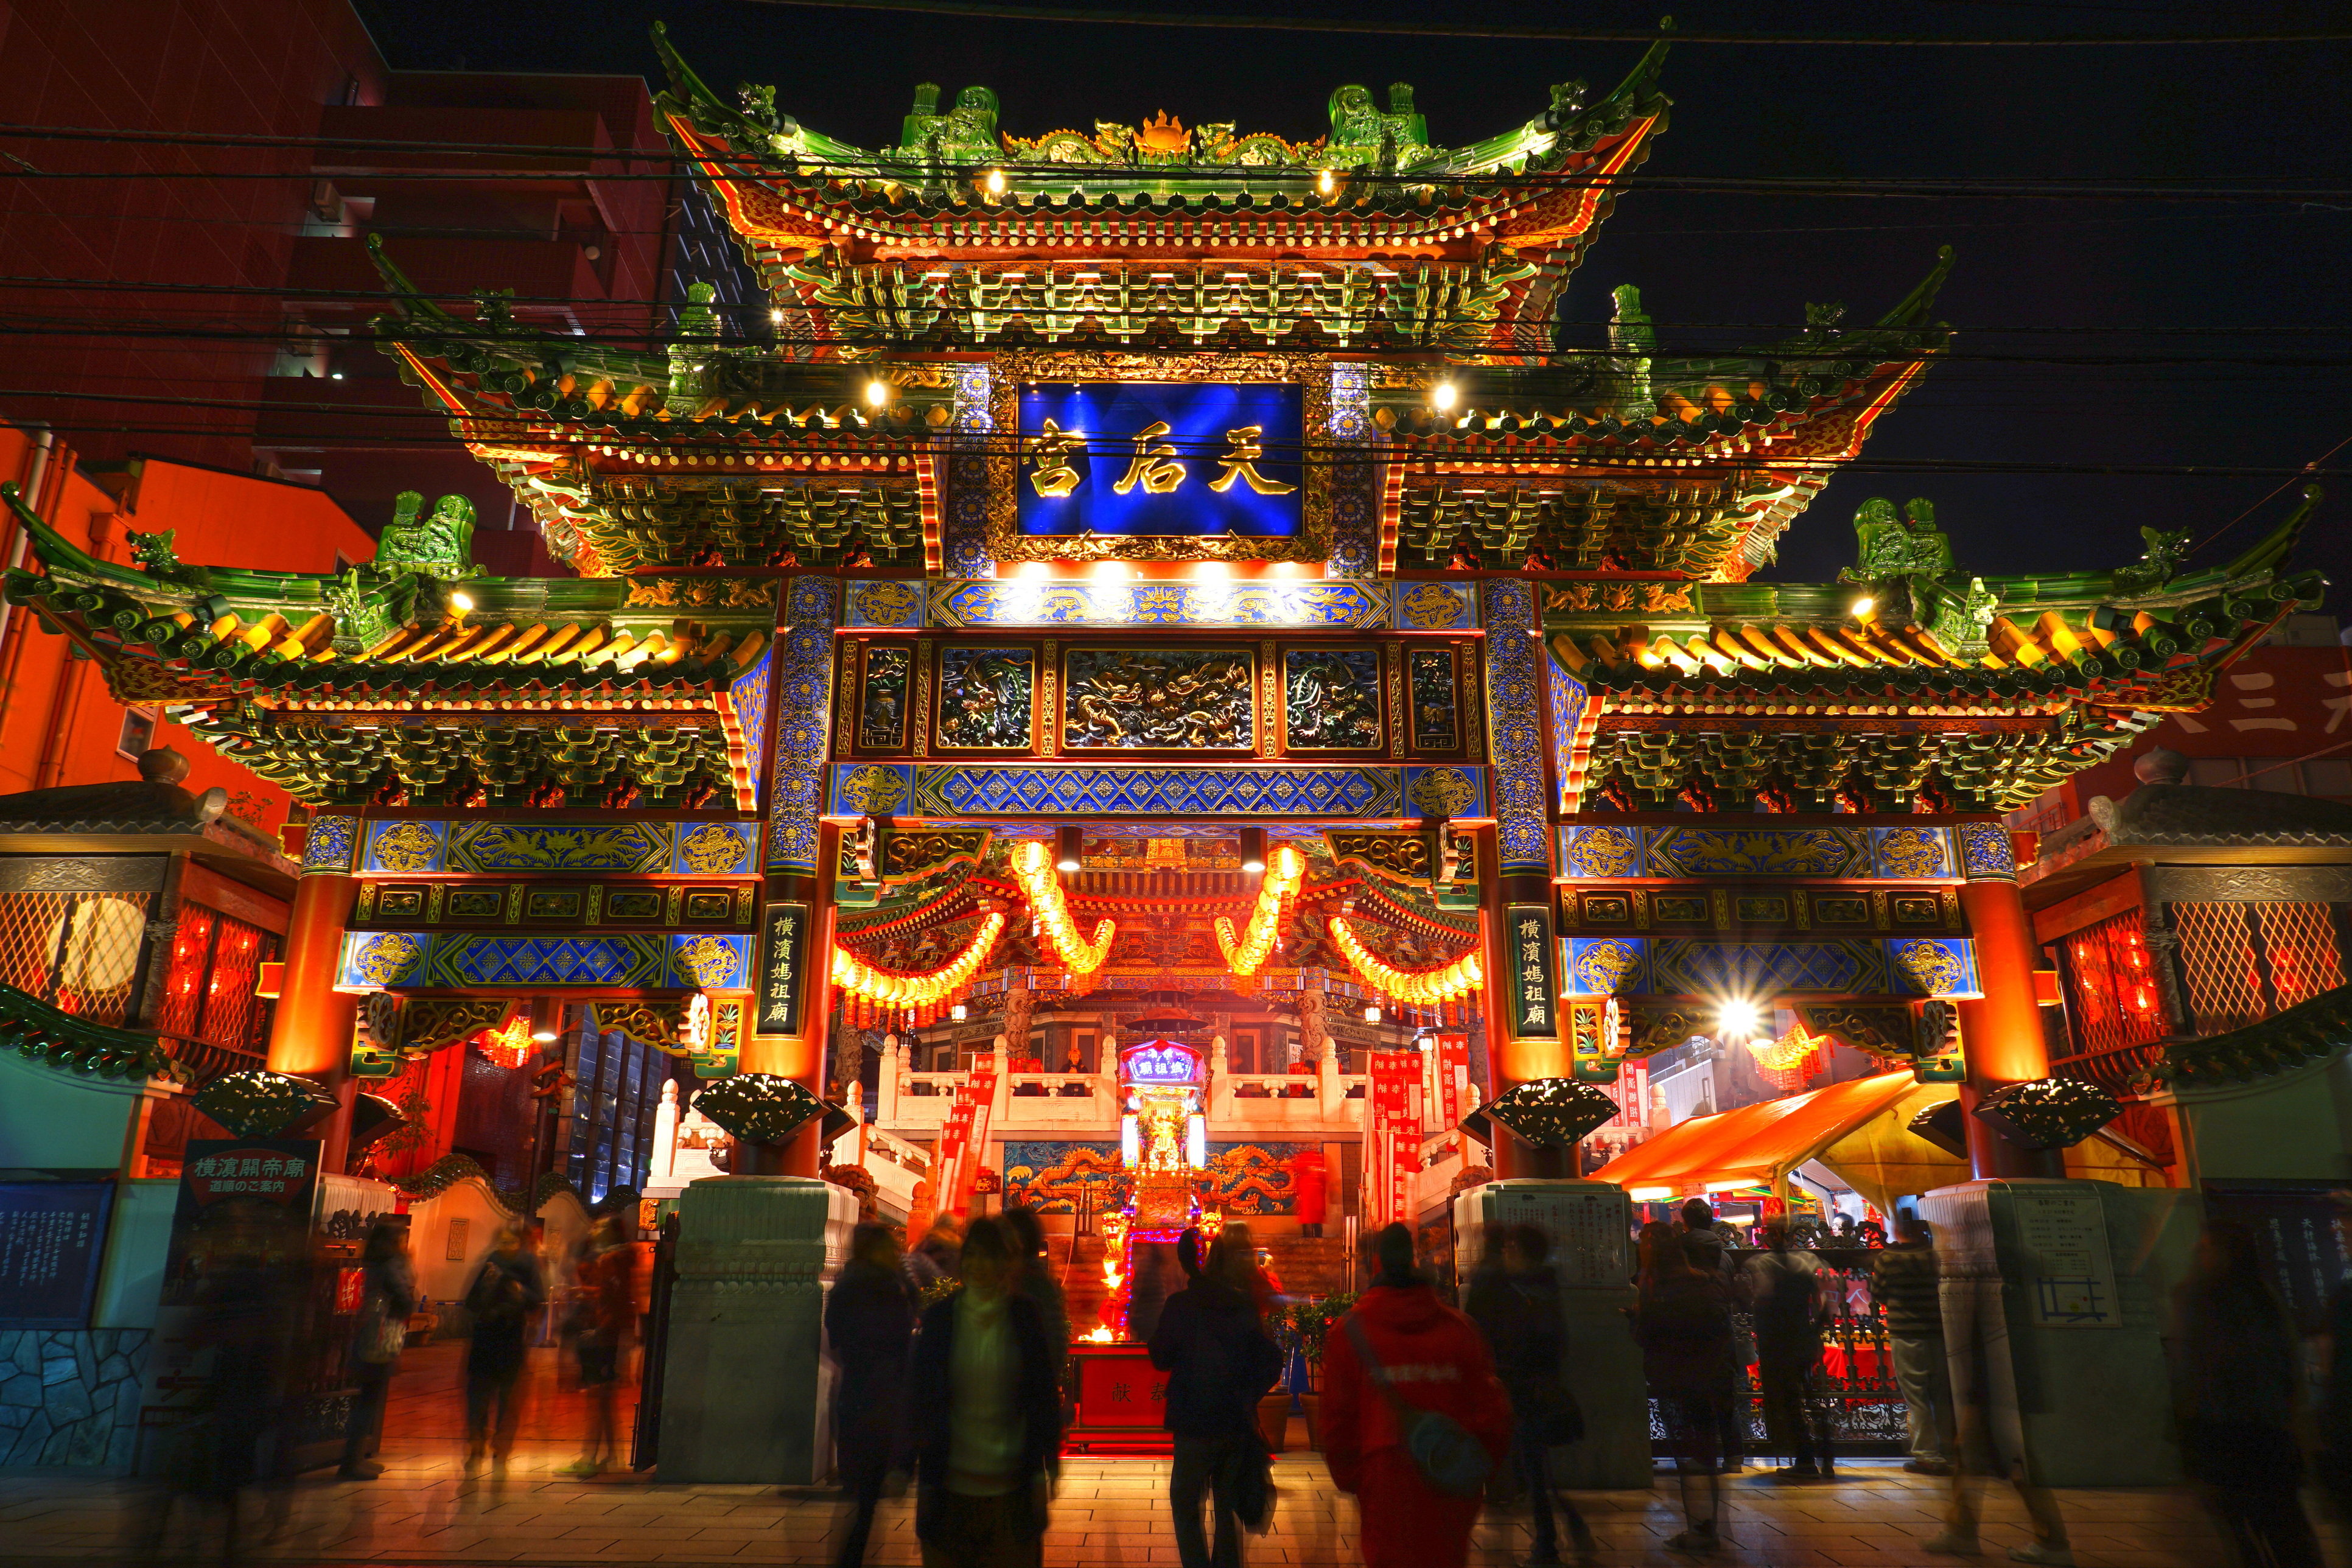 Lantern Festival Early Feb 2021 2021 Tokyo Cheapo